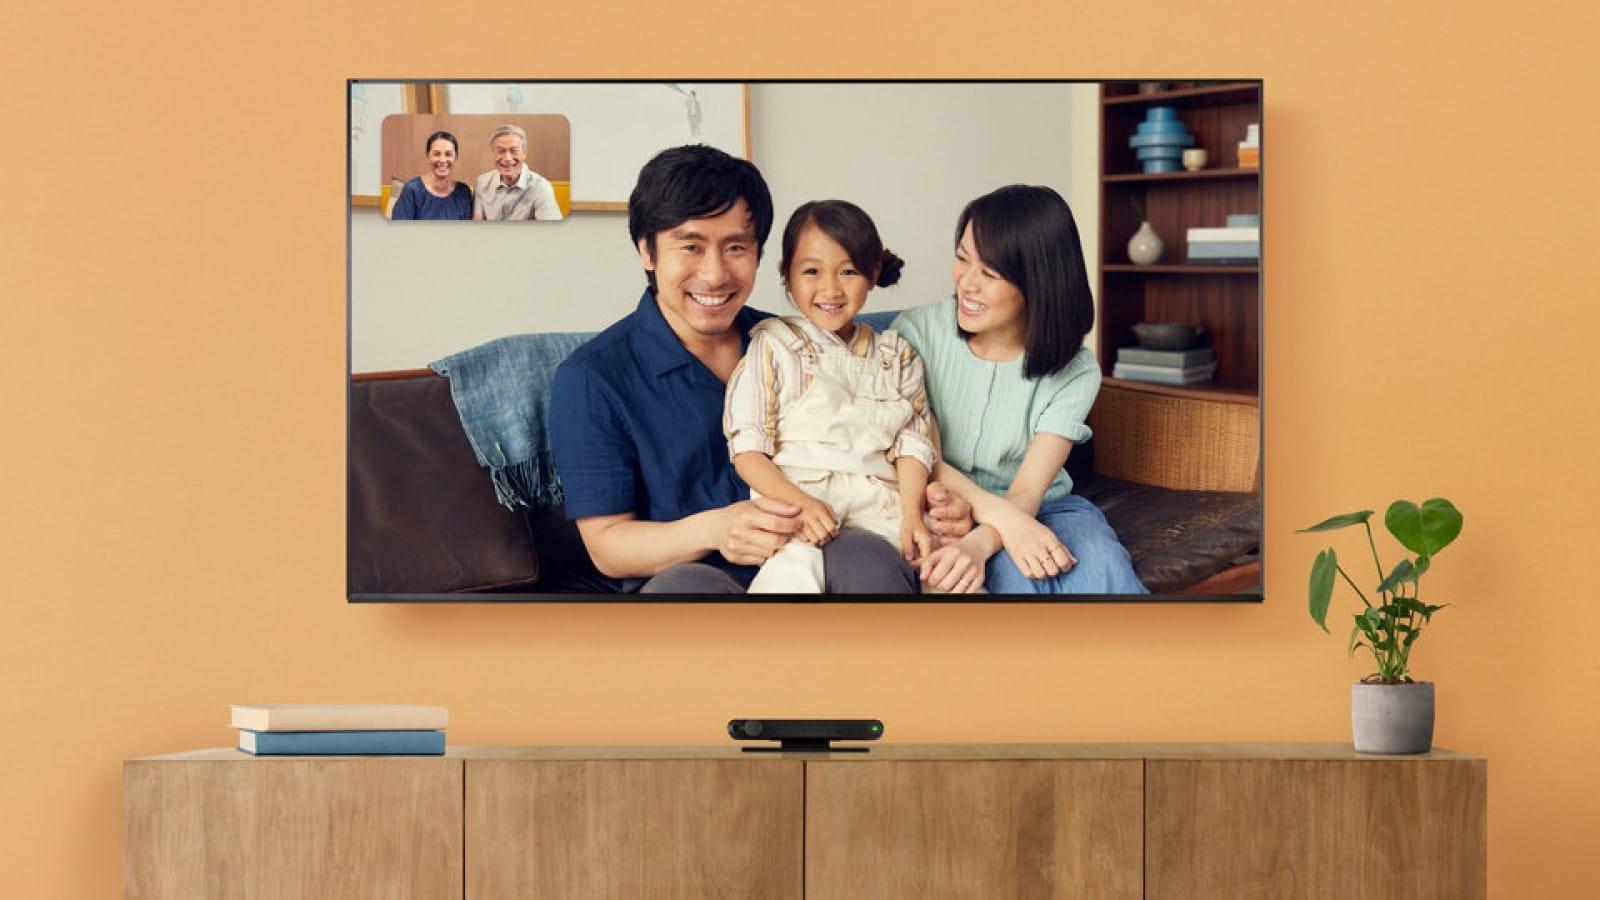 facebook's new portal tv video calling device on an entertainment center